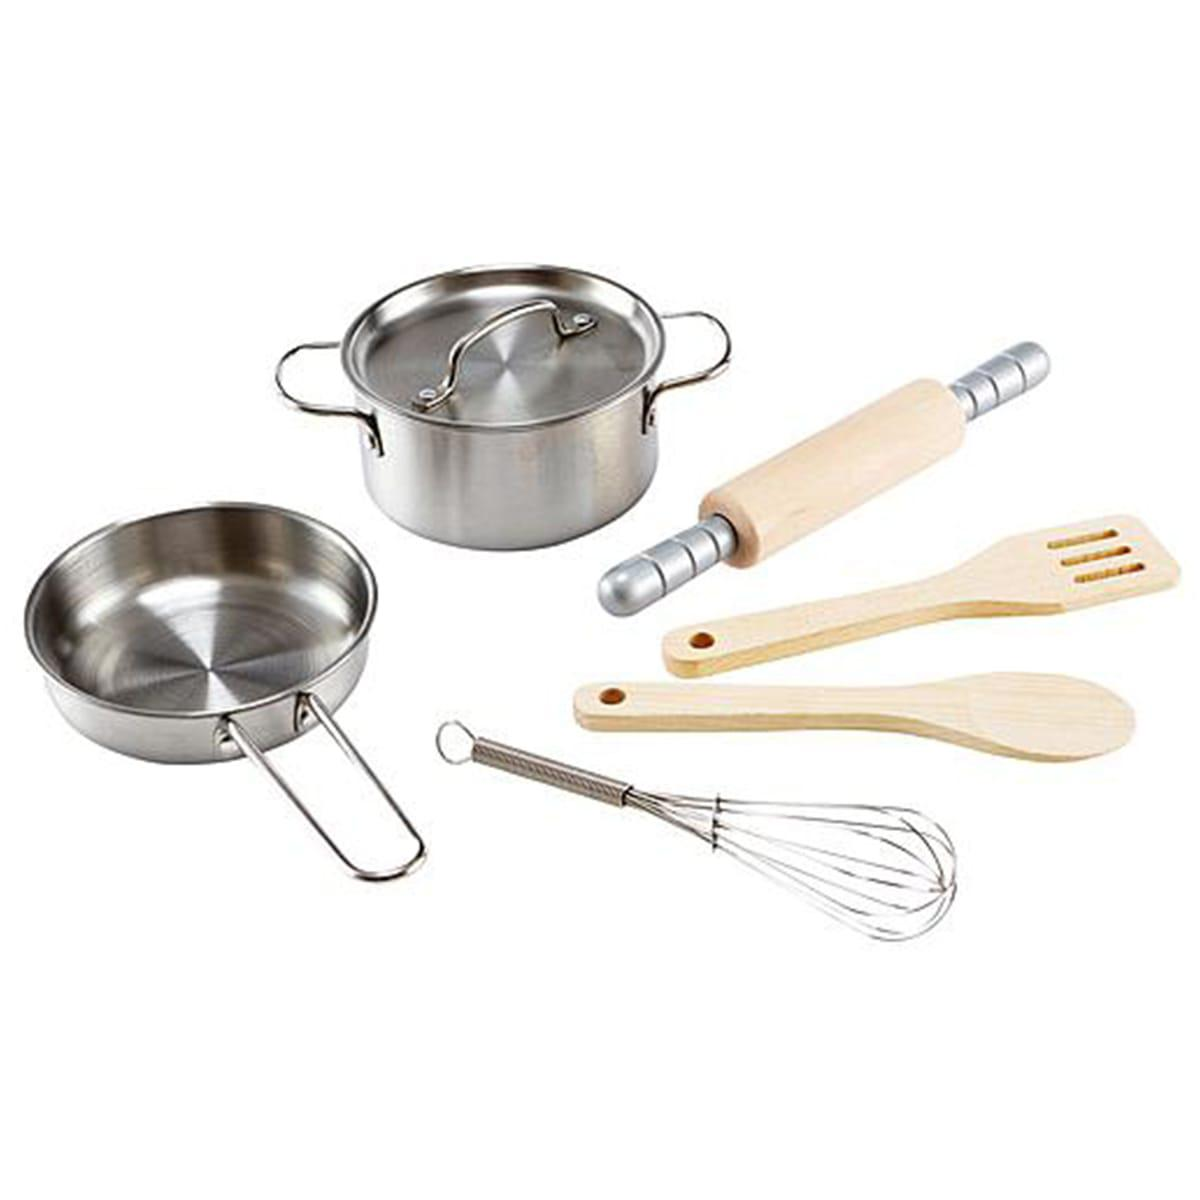 Utensilios cocina-7pzas CHEF COOKING Hape